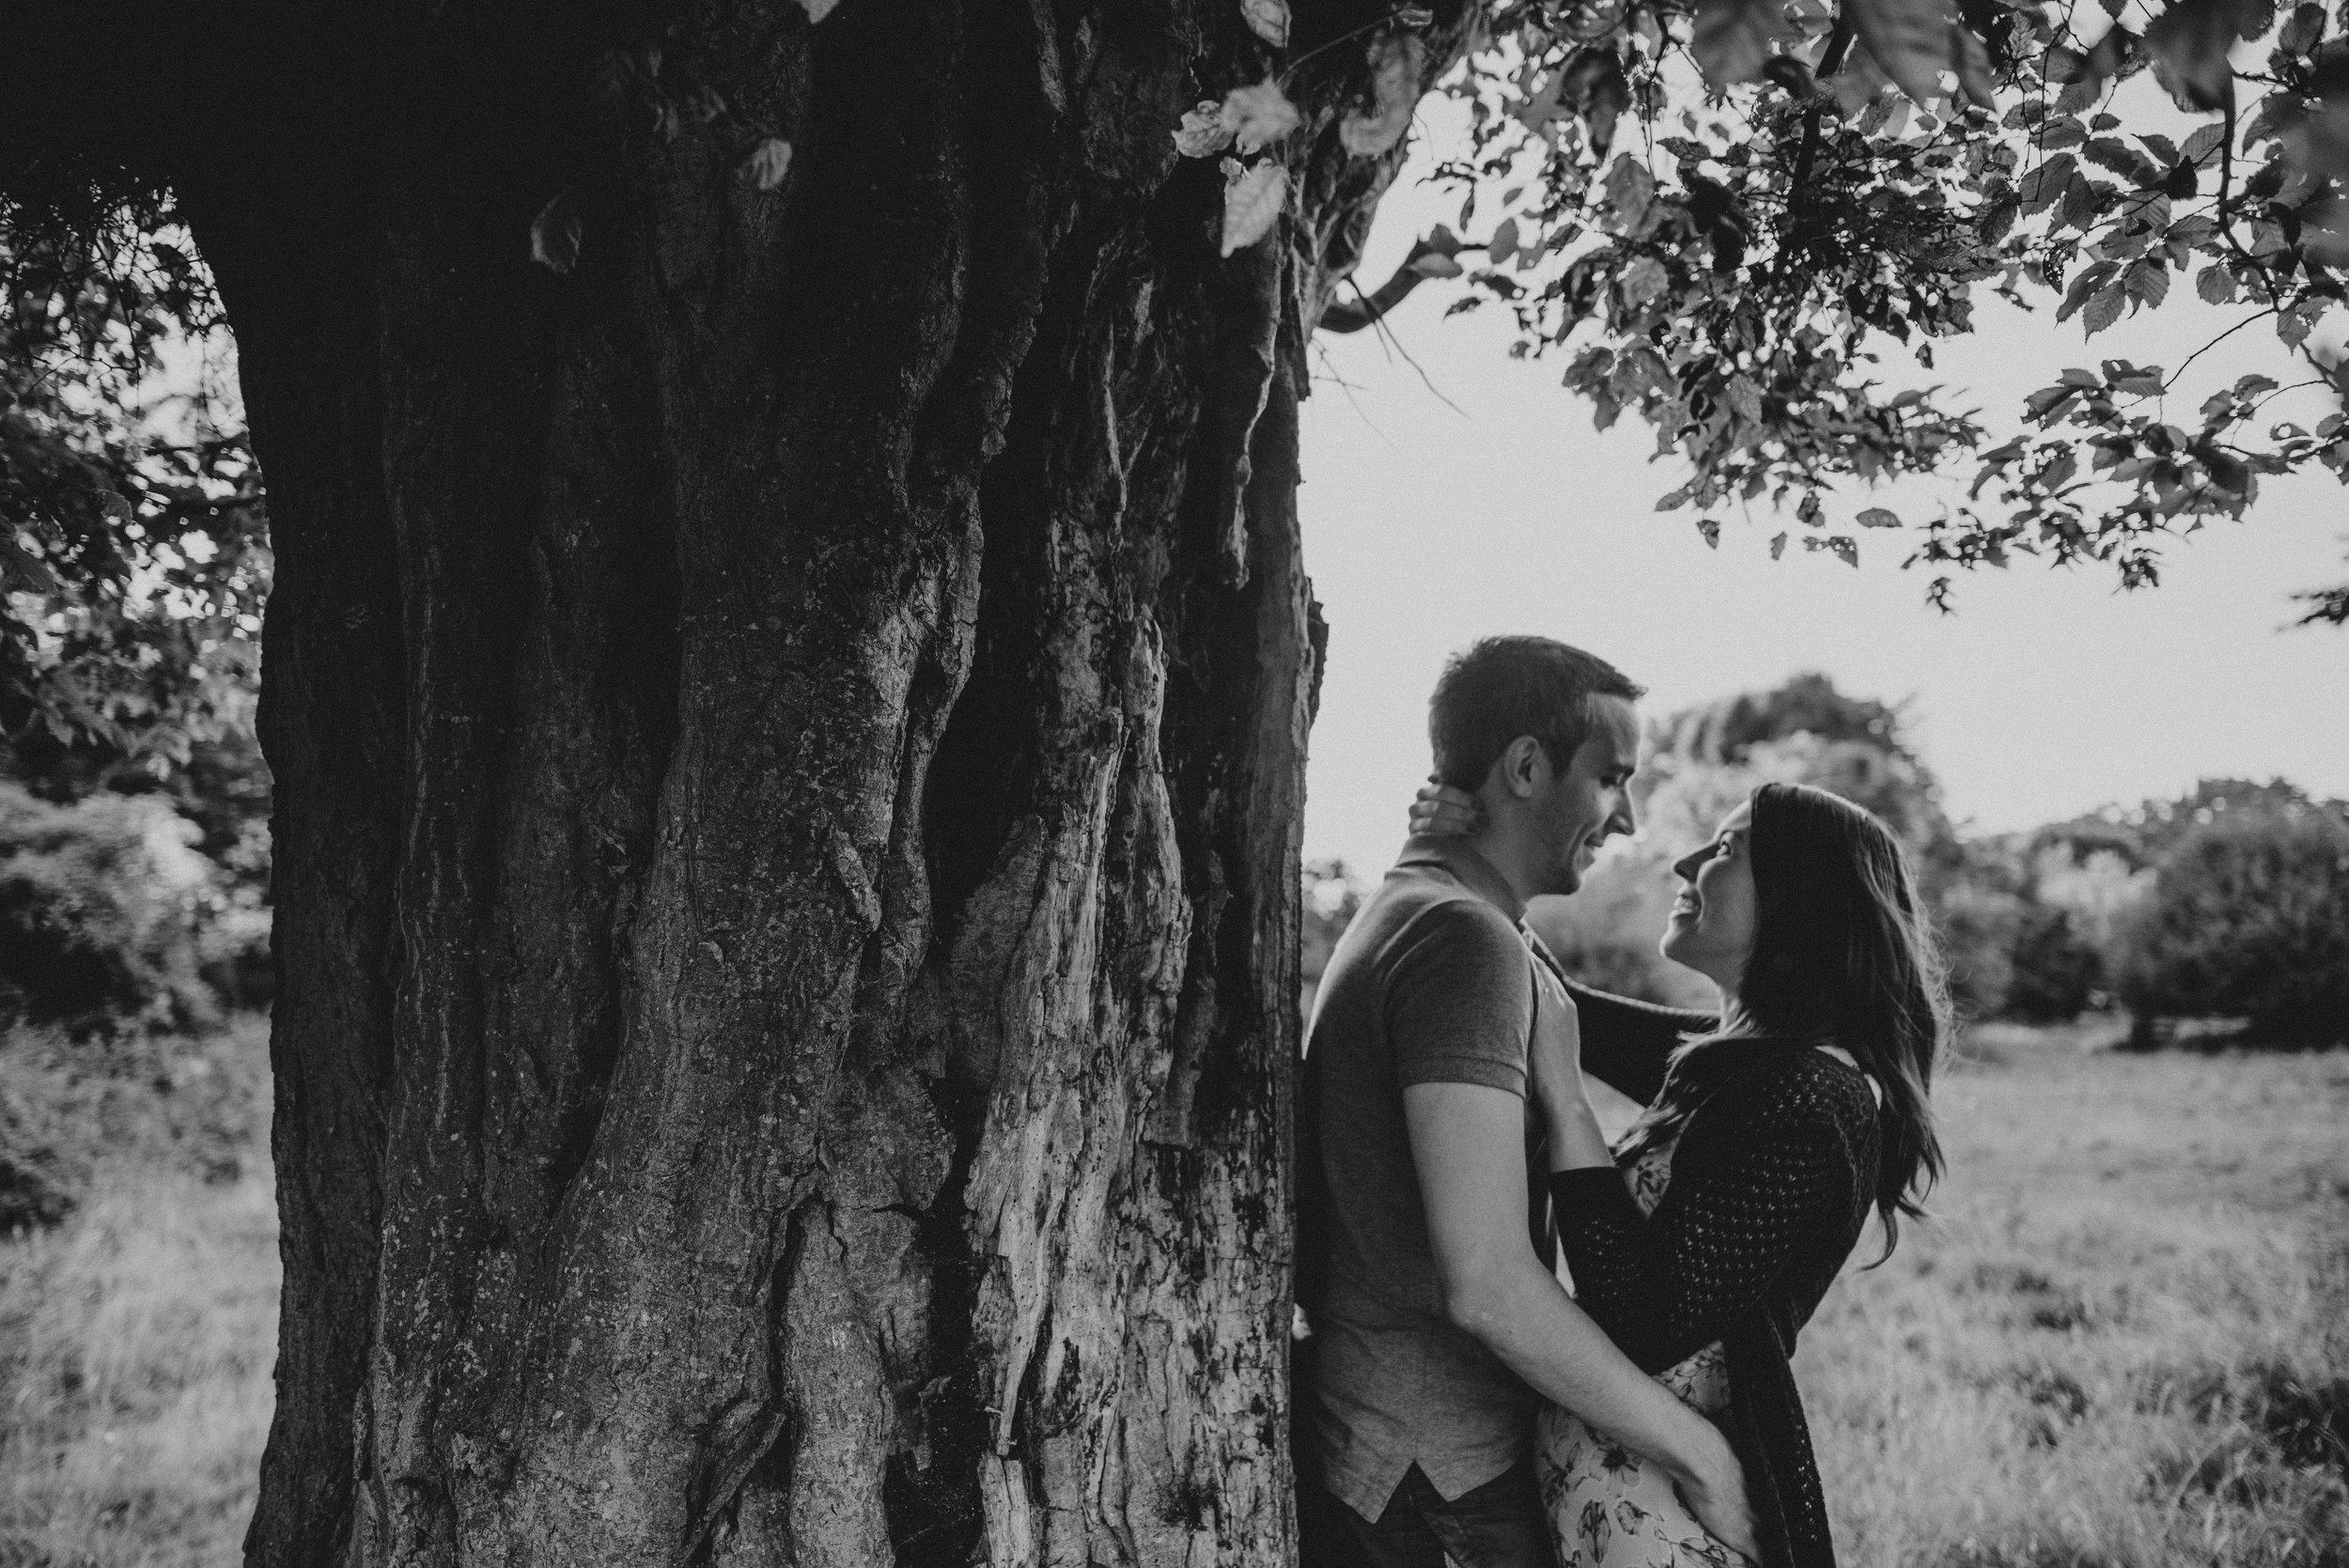 Forest at Sunset Couples Portrait Shoot Essex UK Documentary Portrait Photographer